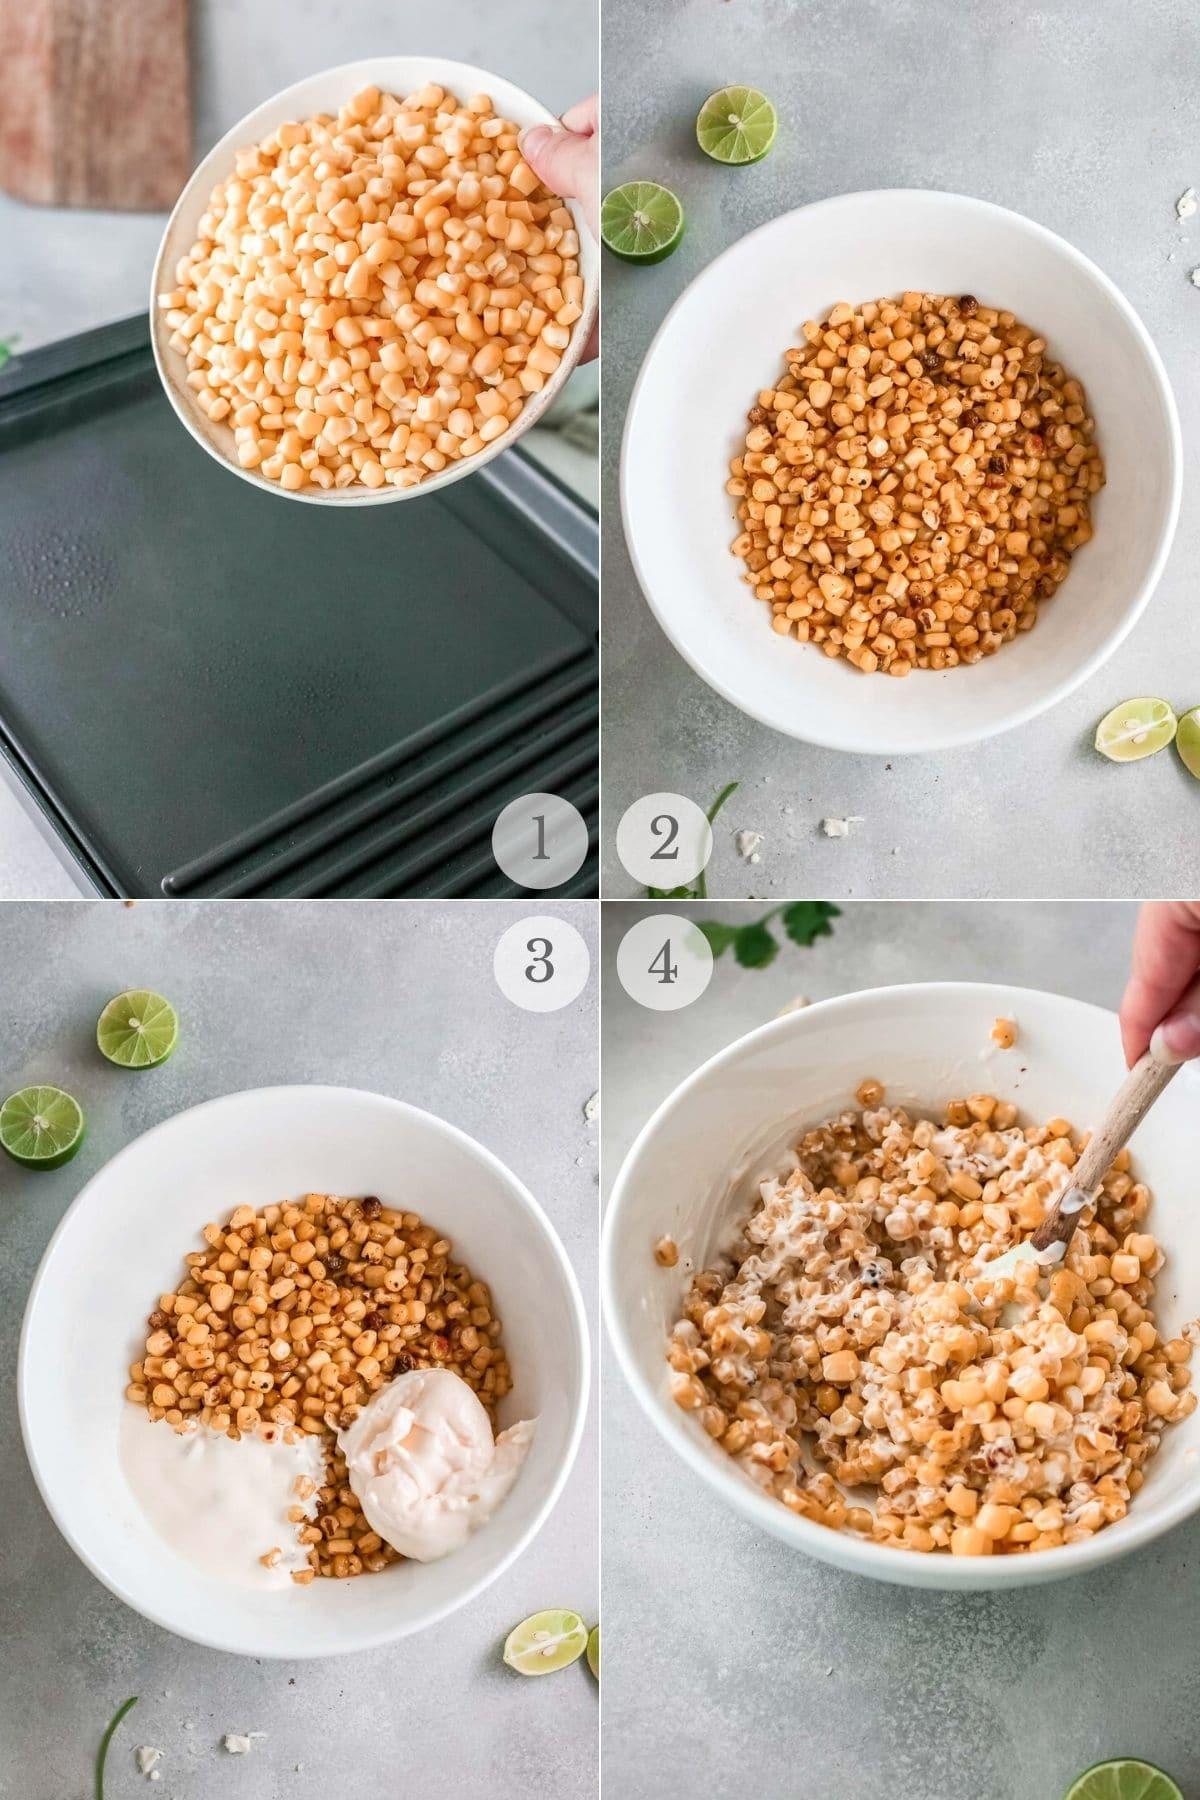 mexican corn dip recipe steps 1-4